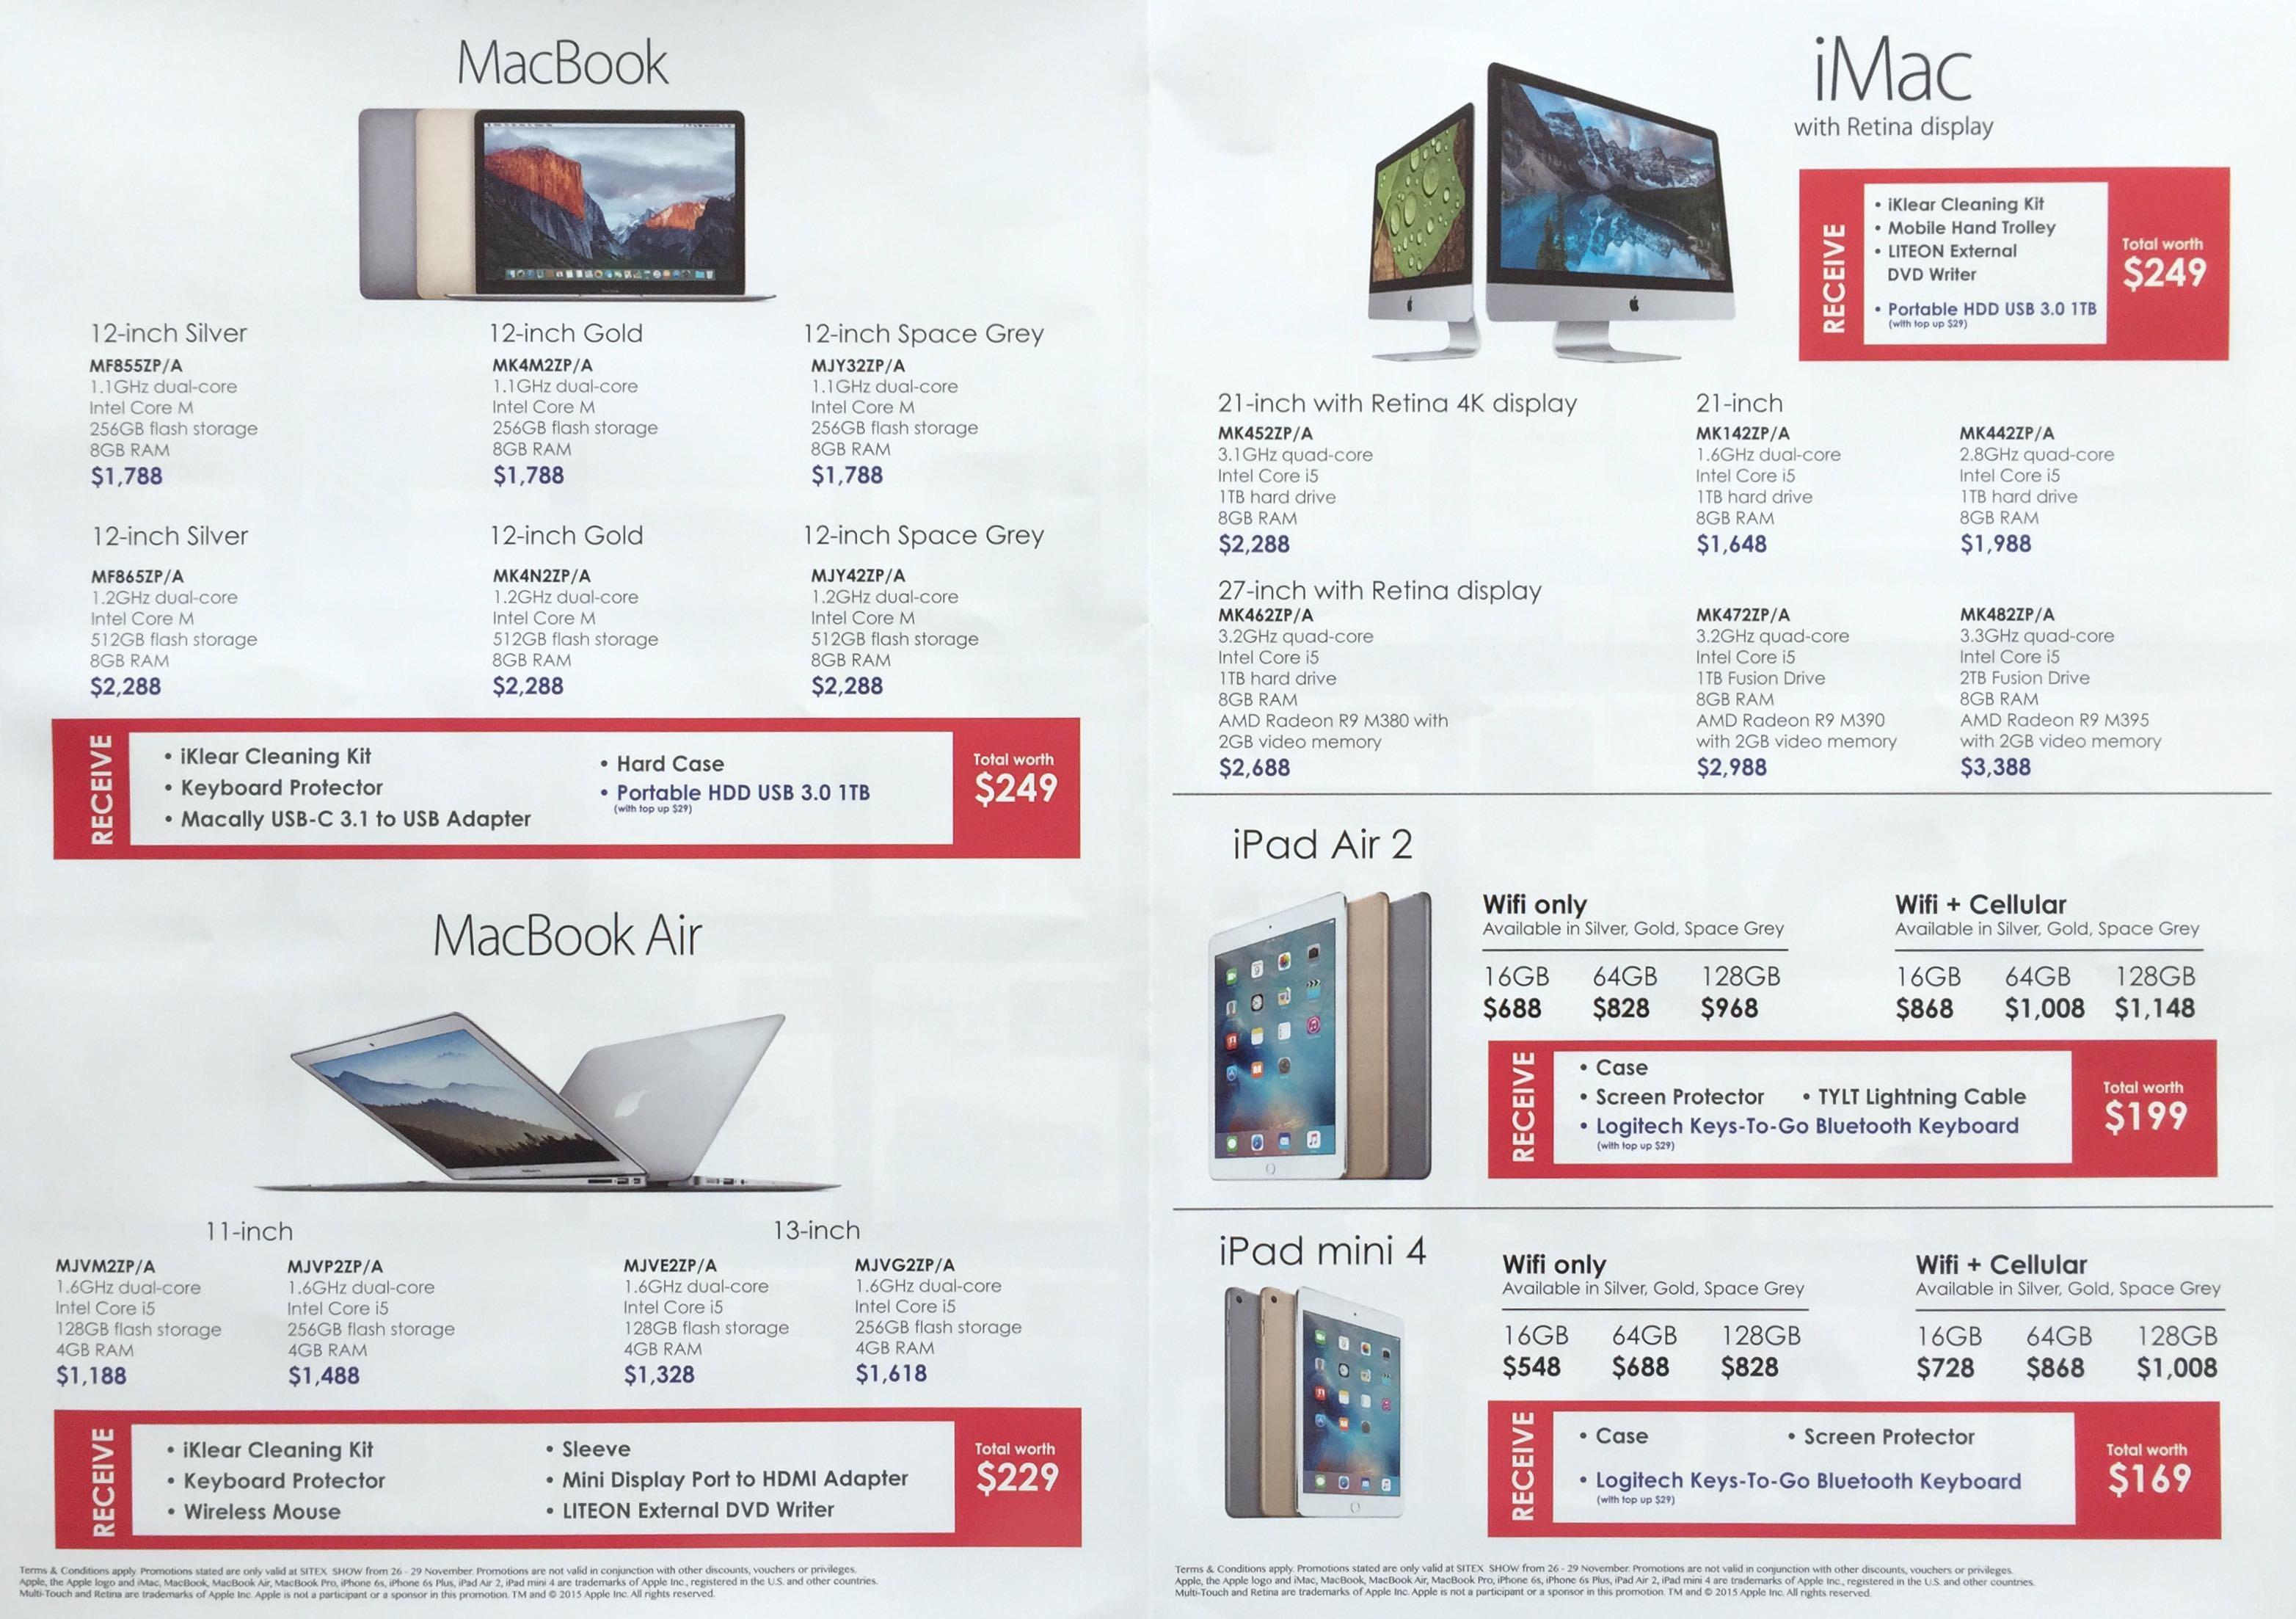 Best Denki @ SITEX 2015 - MacBook / MacBook Air / iMac / iPad Air 2